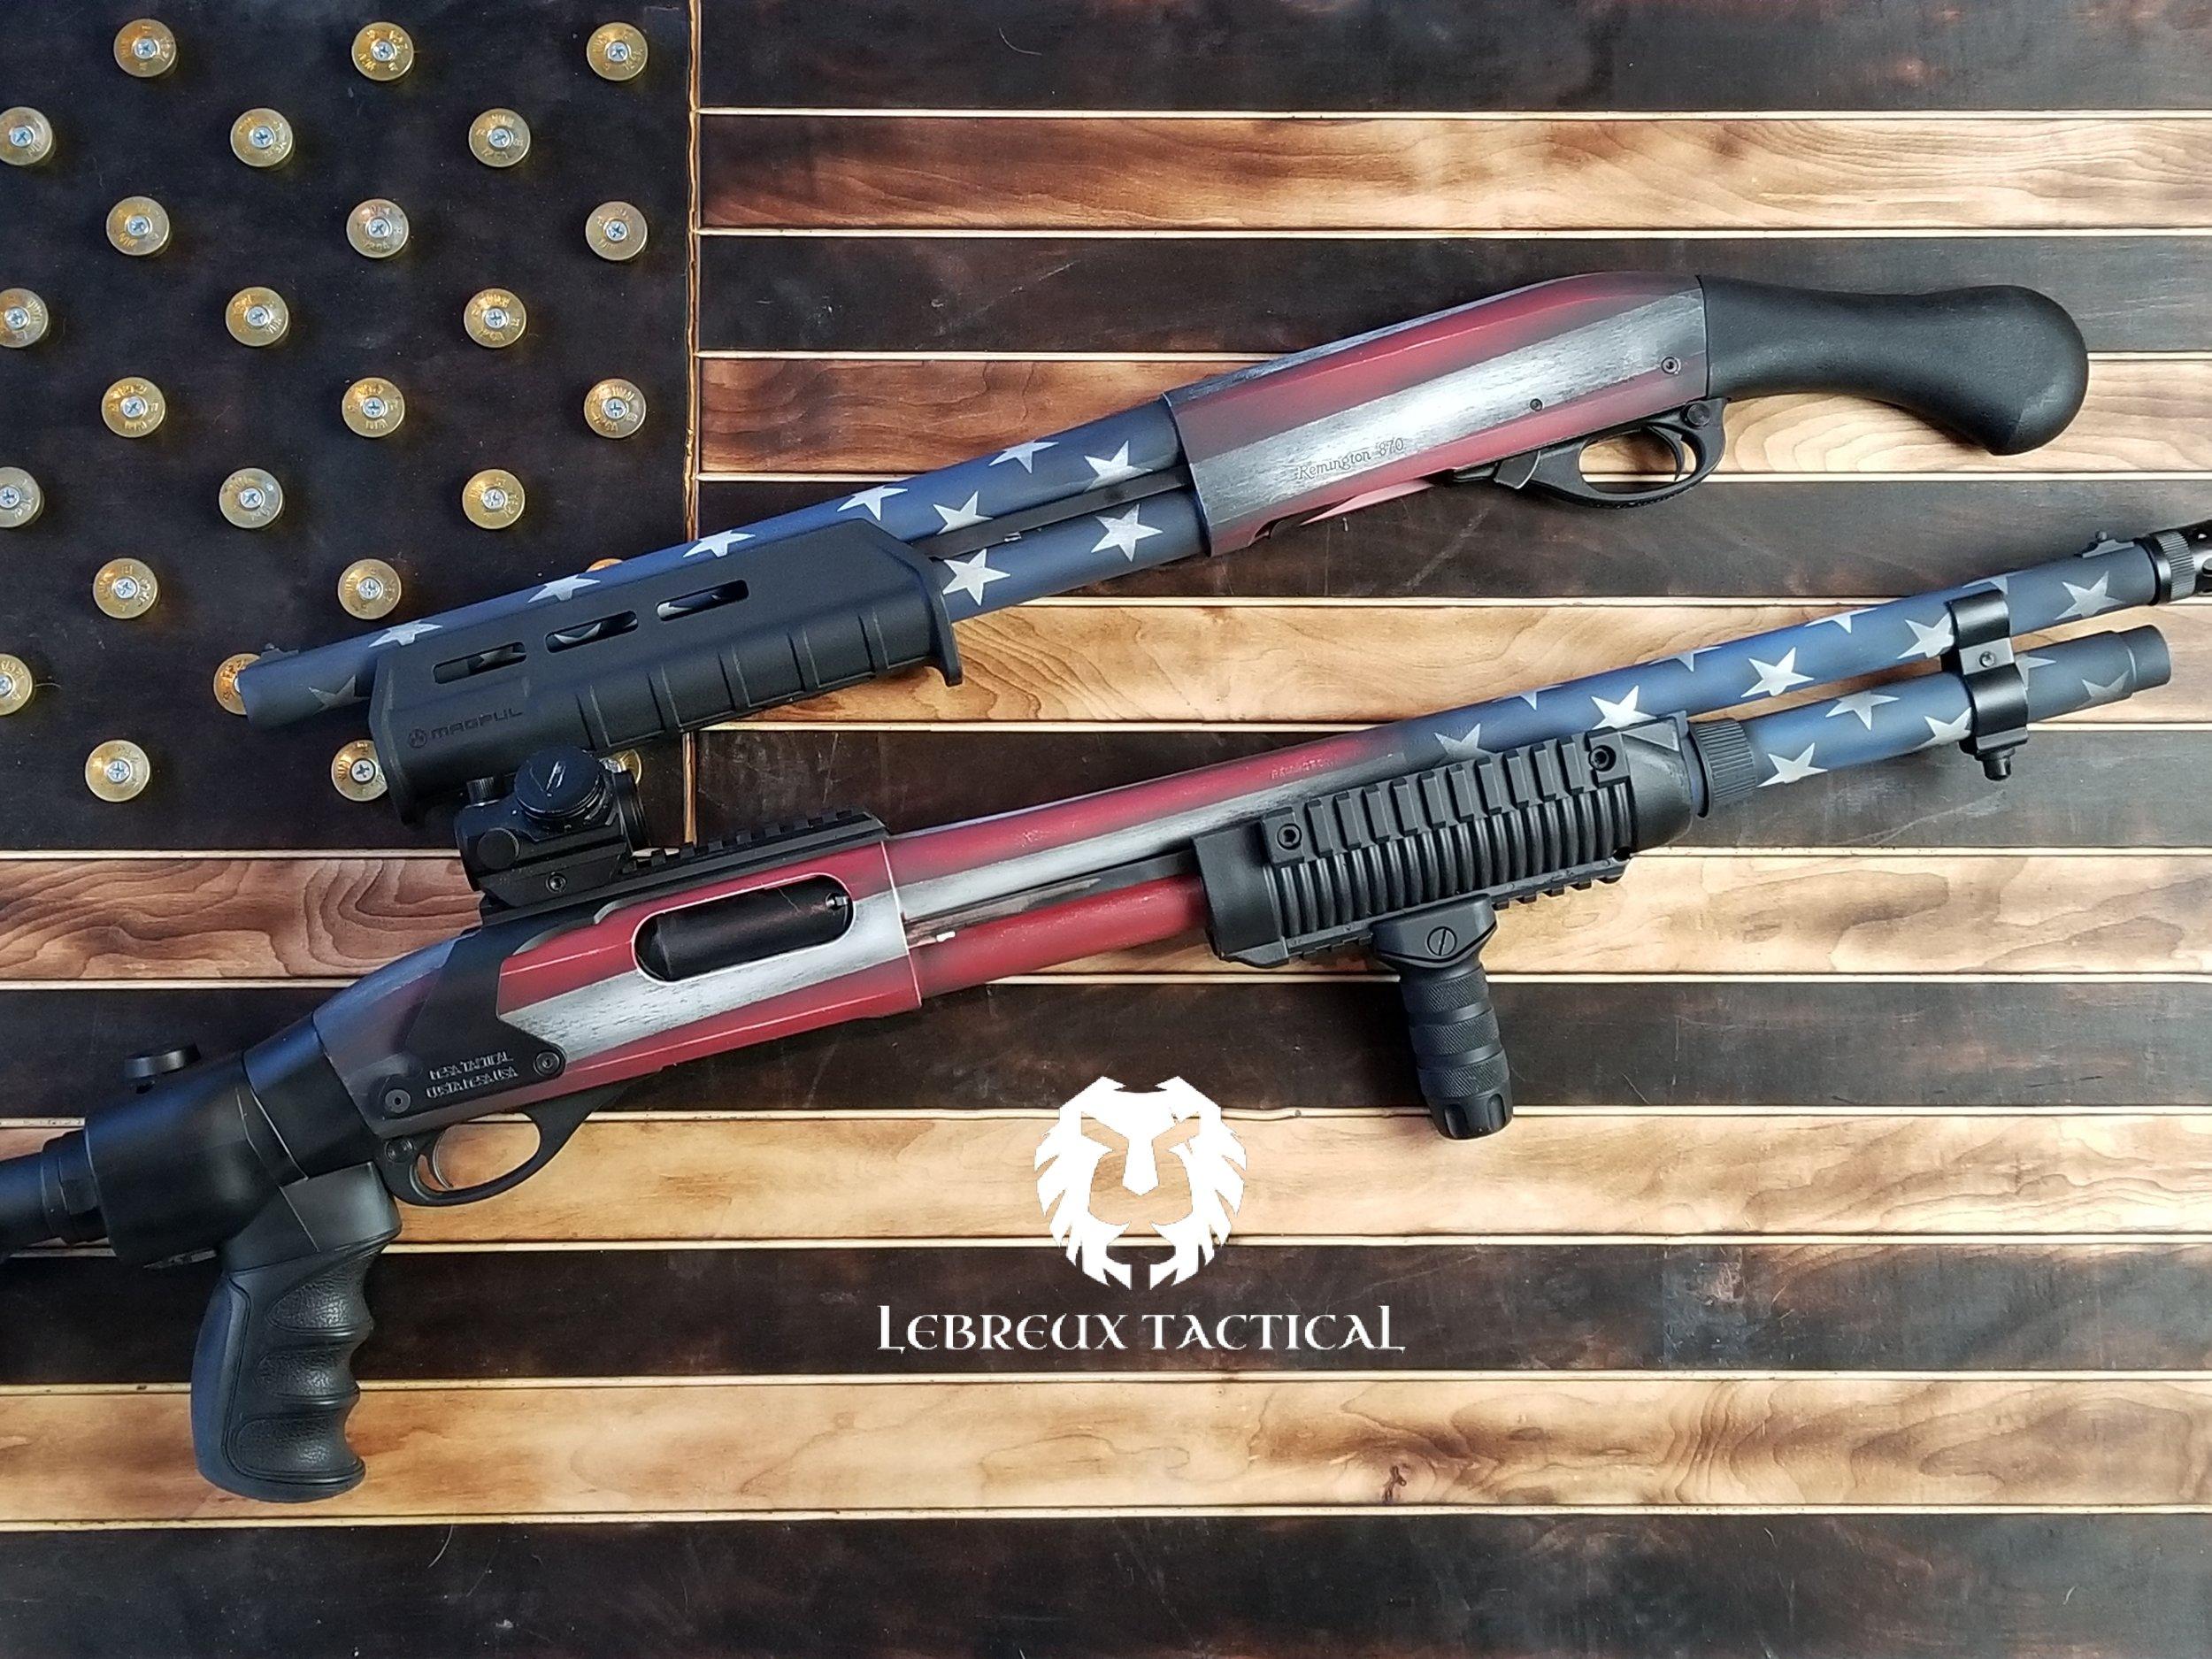 Remington 870 cerakote.jpg